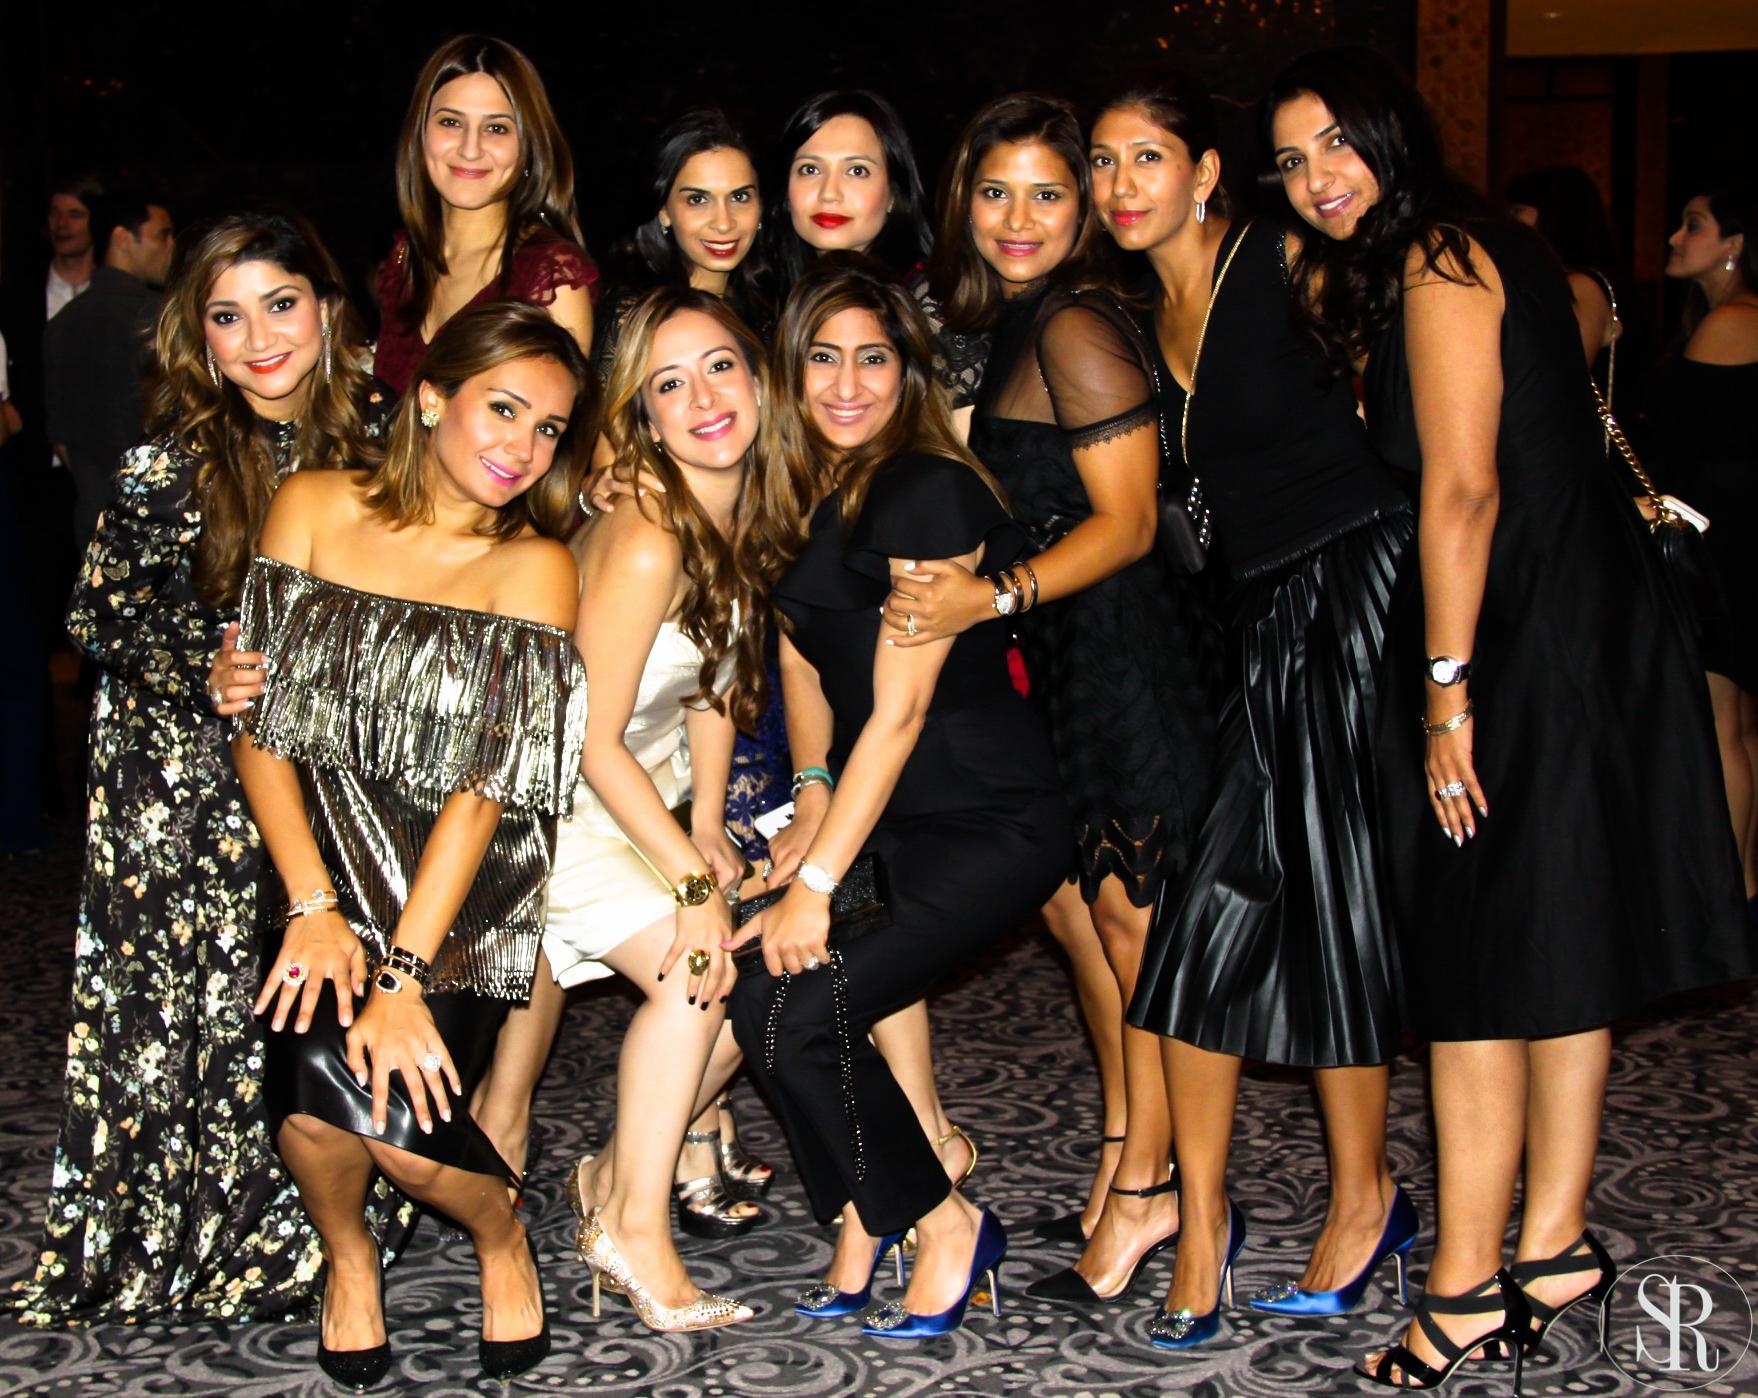 VIP launch of MANOLO BLAHNIK collection Fashion Afternoon Tea by Raffles Dubai-4232.jpg